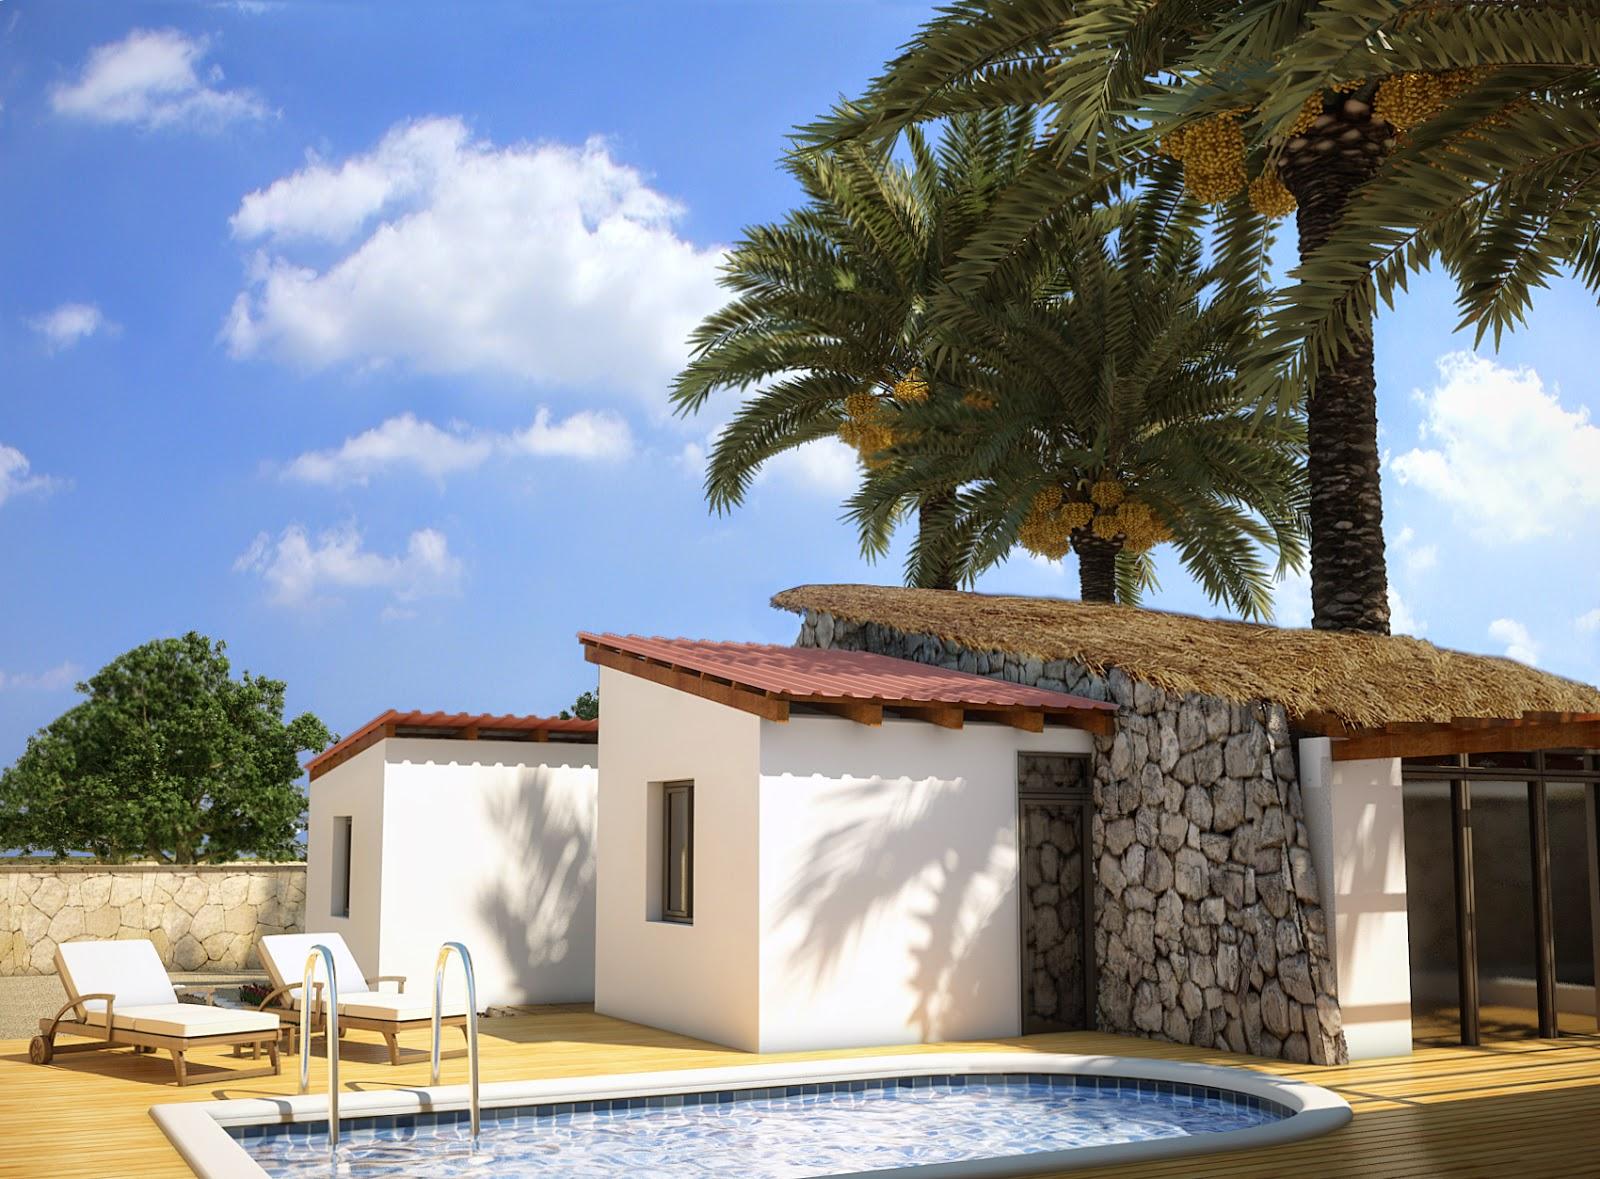 Construir mi propia casa good full size of casa de paja - Construir mi propia casa ...